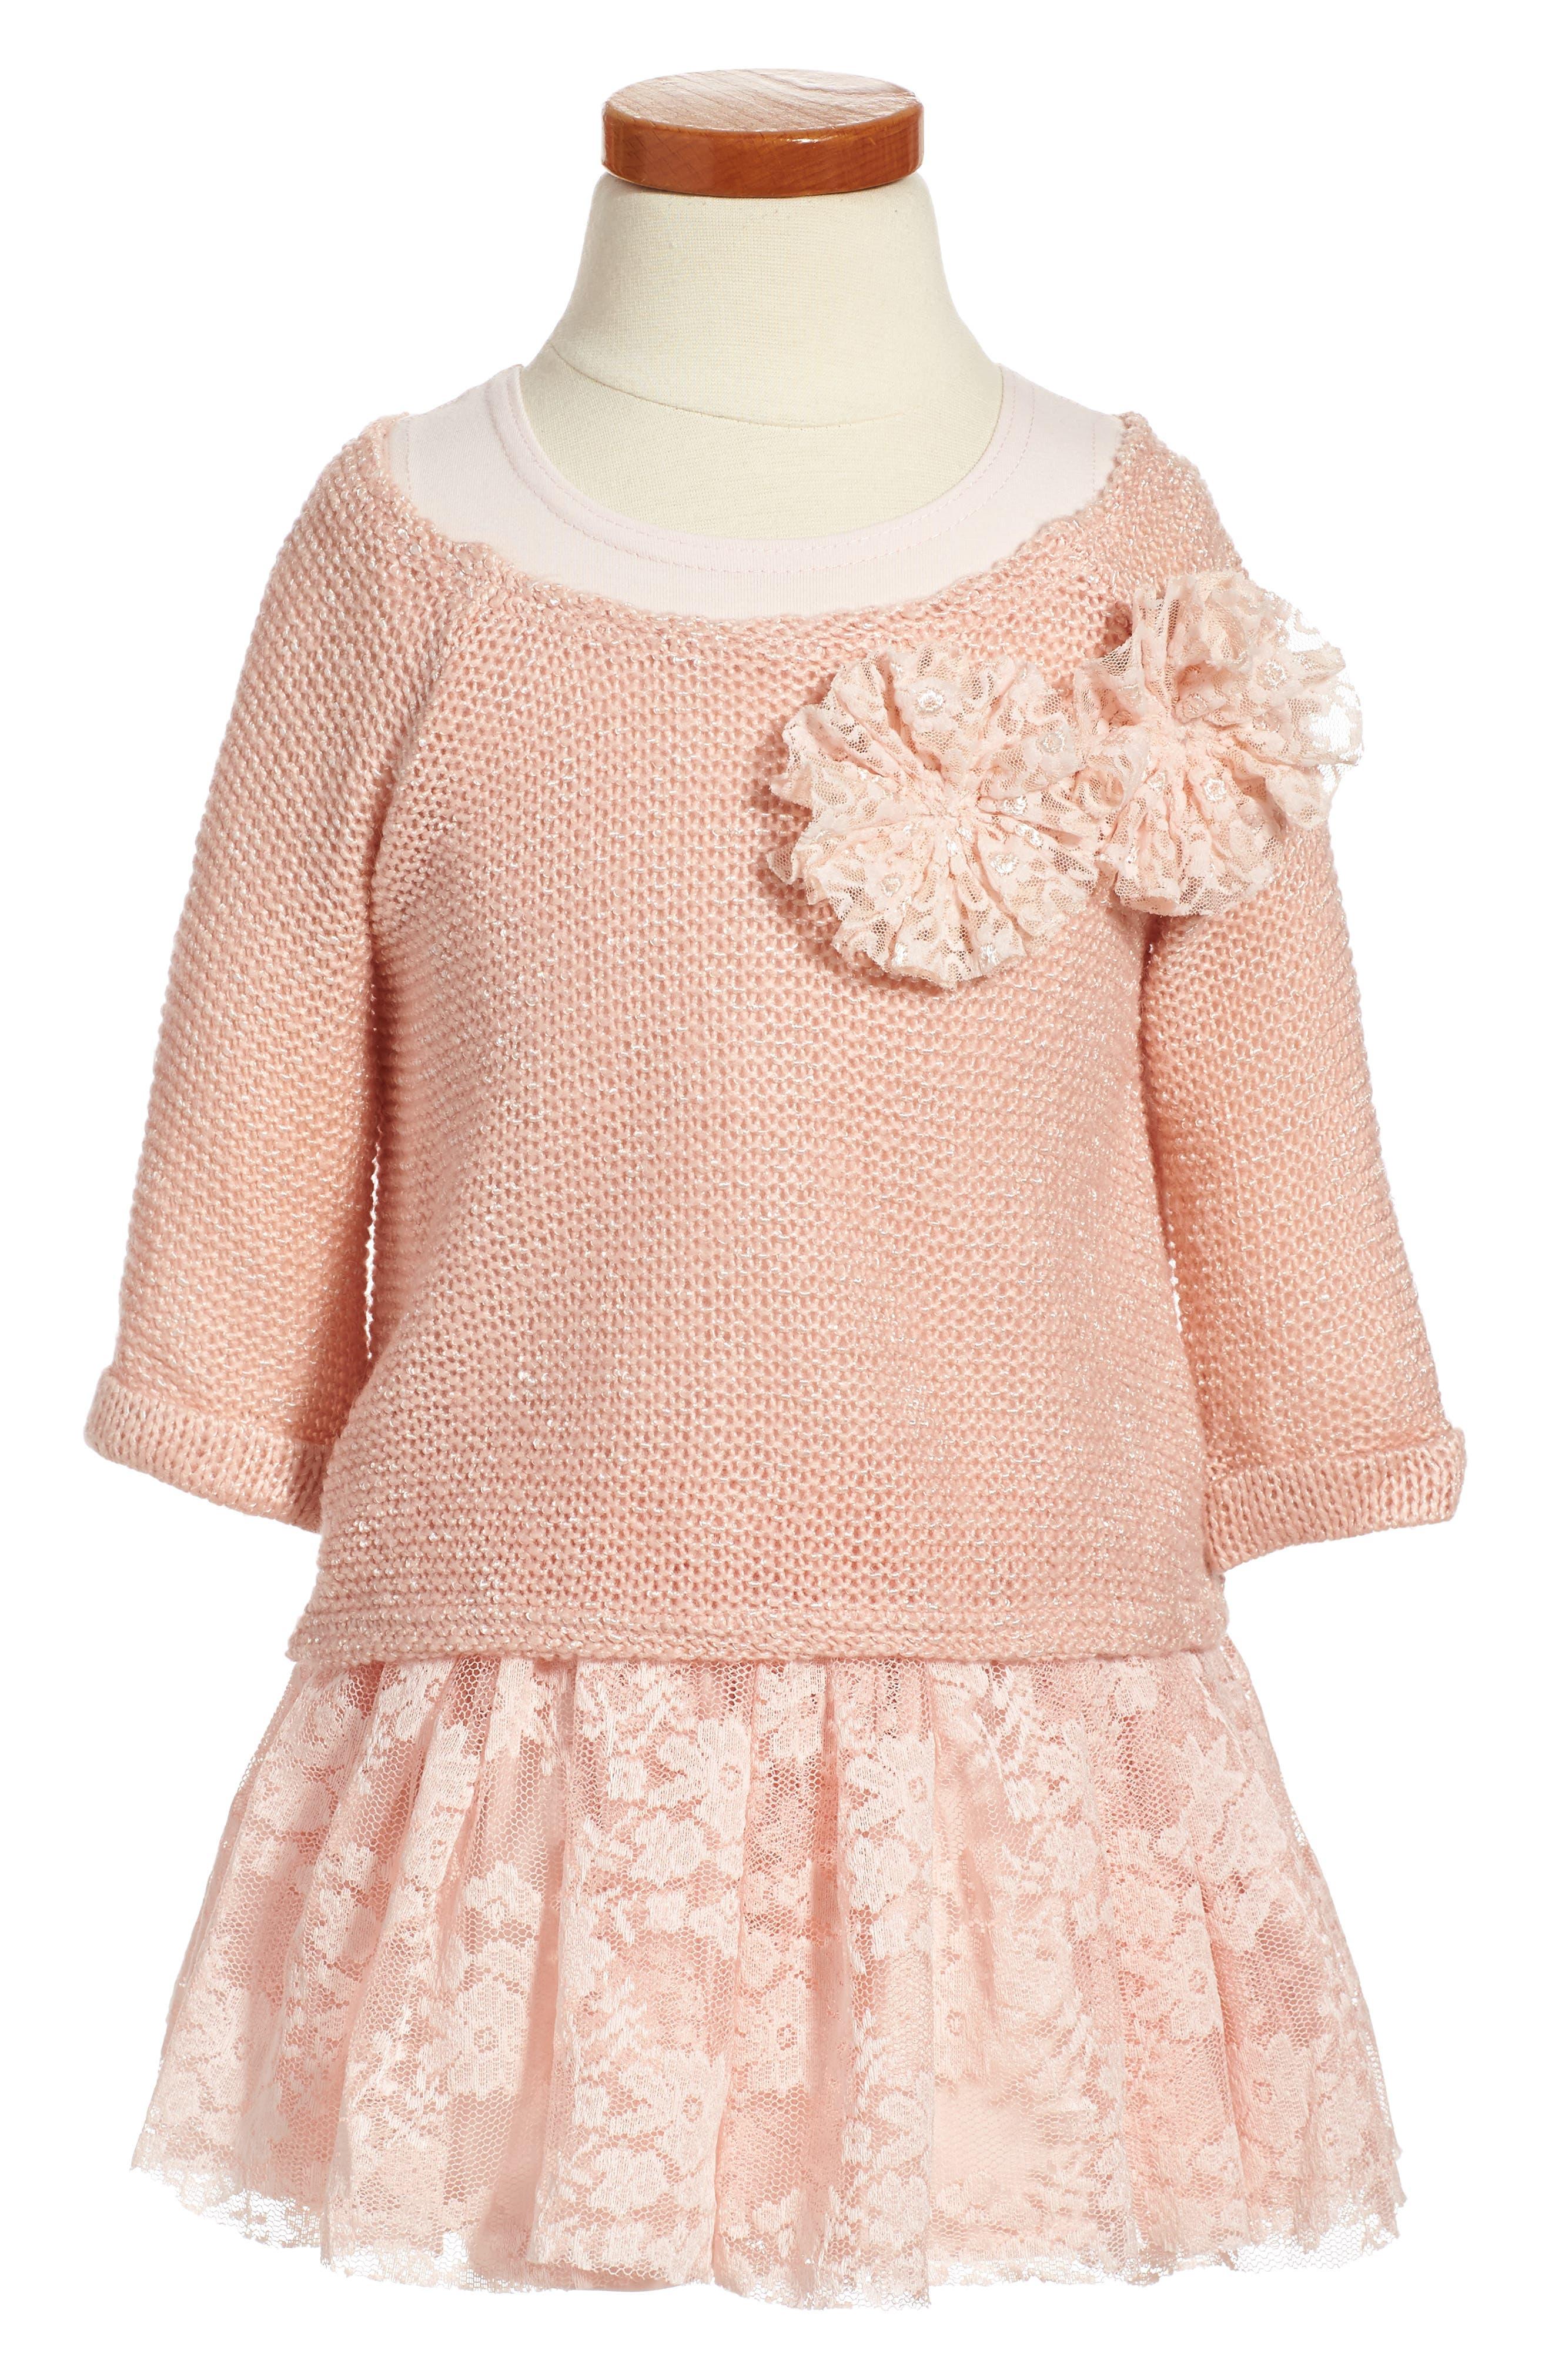 Alternate Image 1 Selected - Pippa & Julie Sweater & Lace Skirt Dress (Toddler Girls, Little Girls & Big Girls)